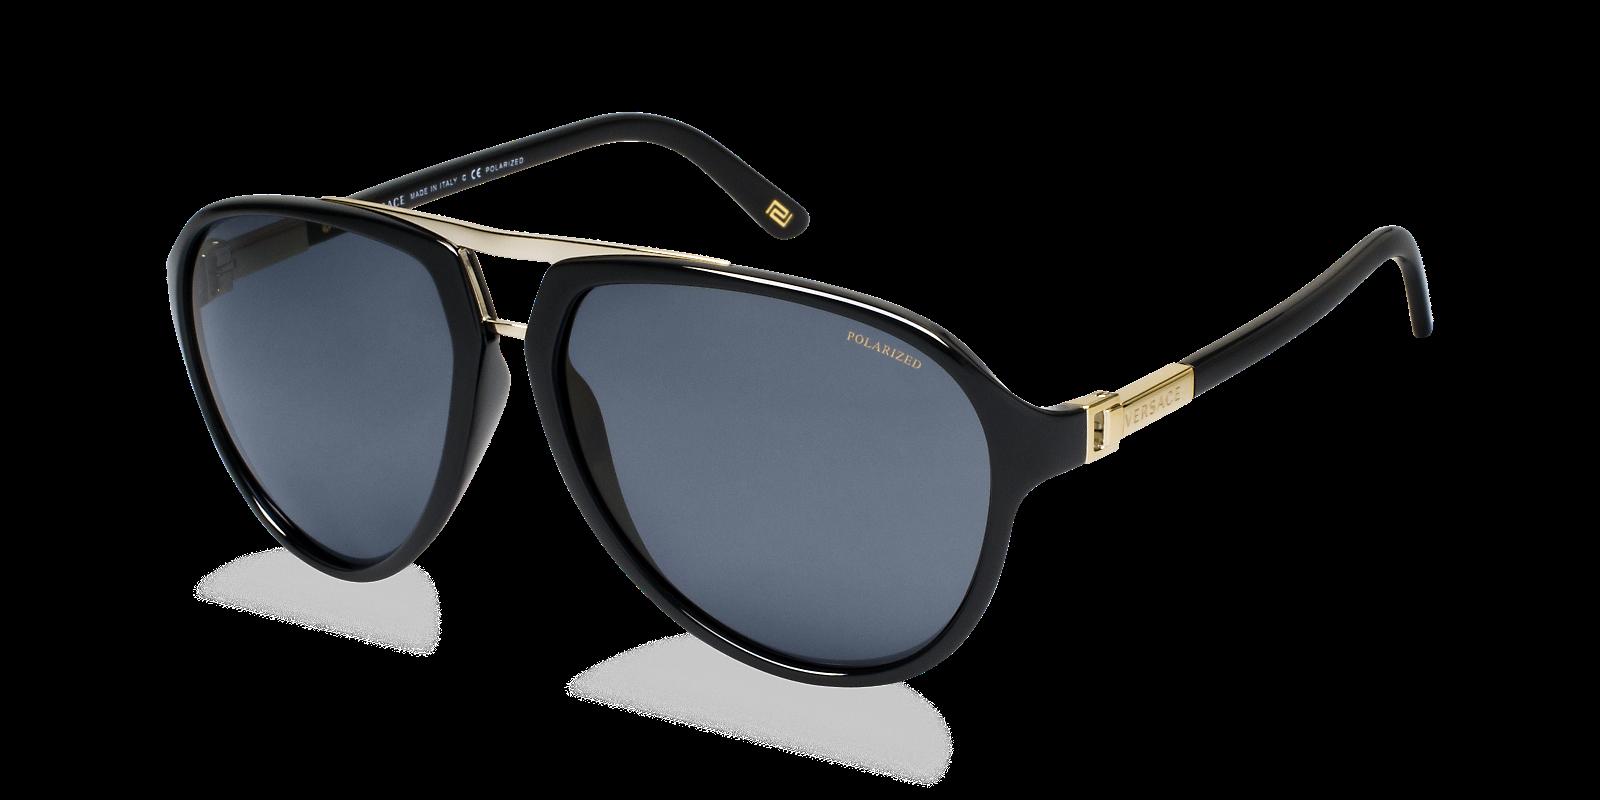 Black Sunglasses Glasses Png Image Black Sunglasses Sunglasses Brown Sunglasses